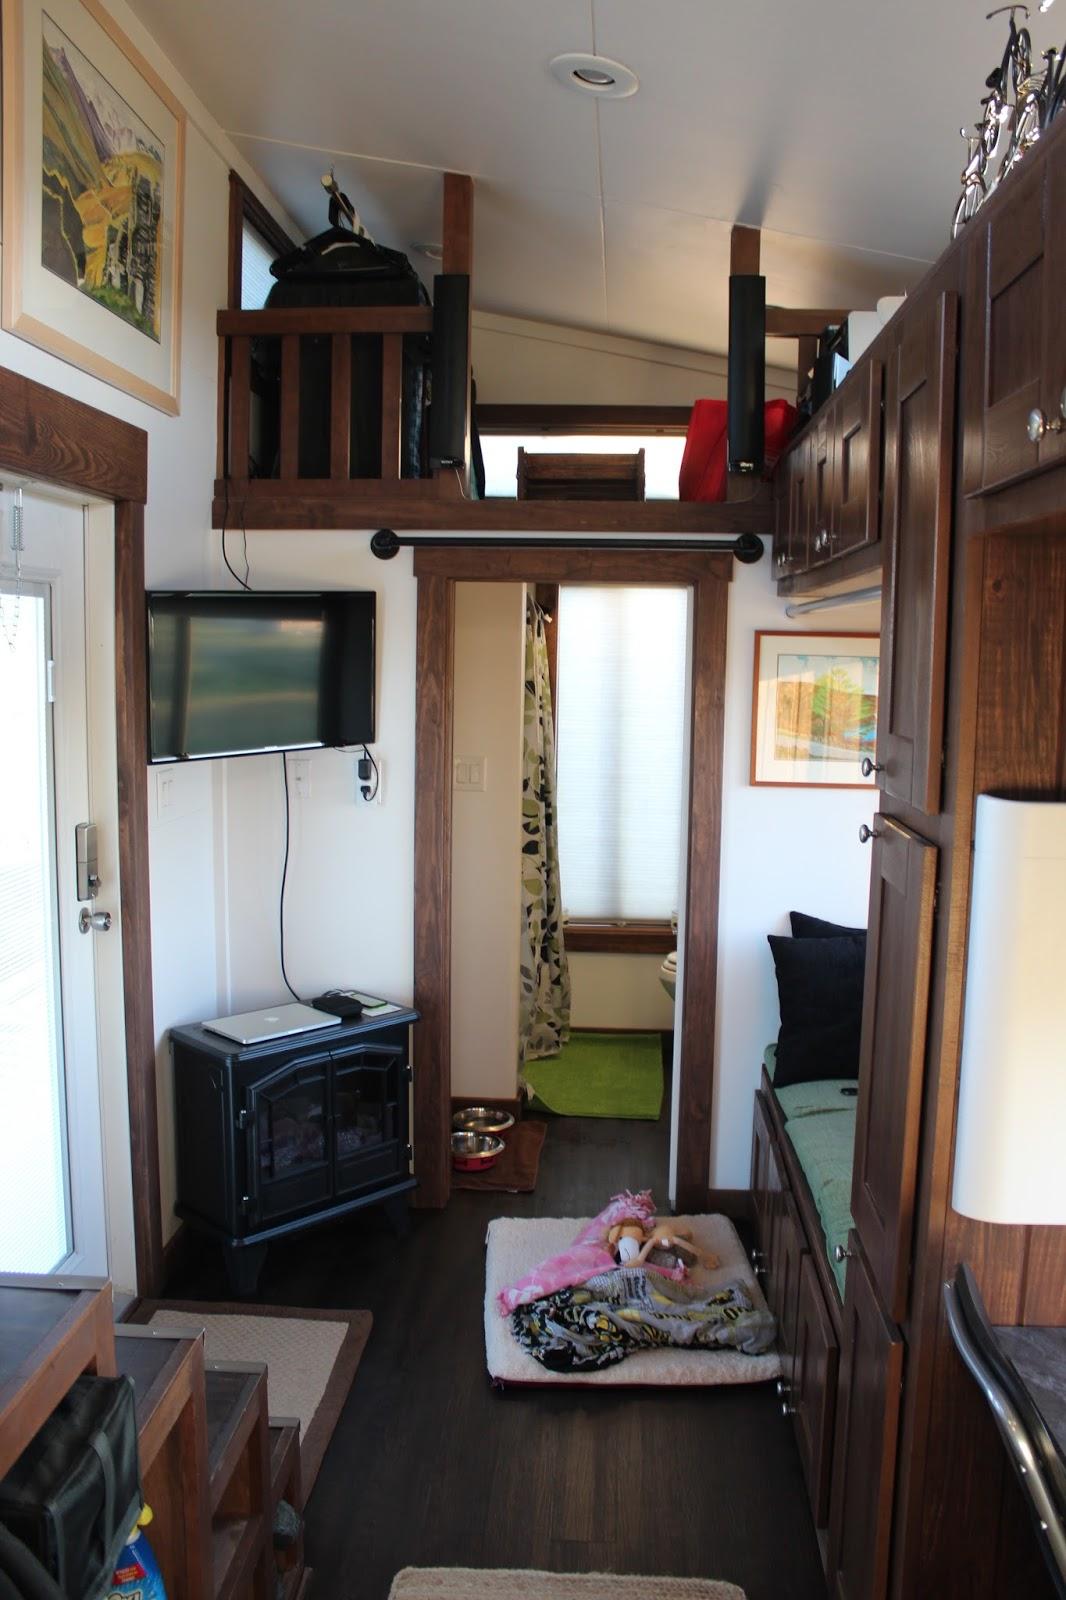 TINY HOUSE TOWN Morrison Tiny House 300 Sq Ft